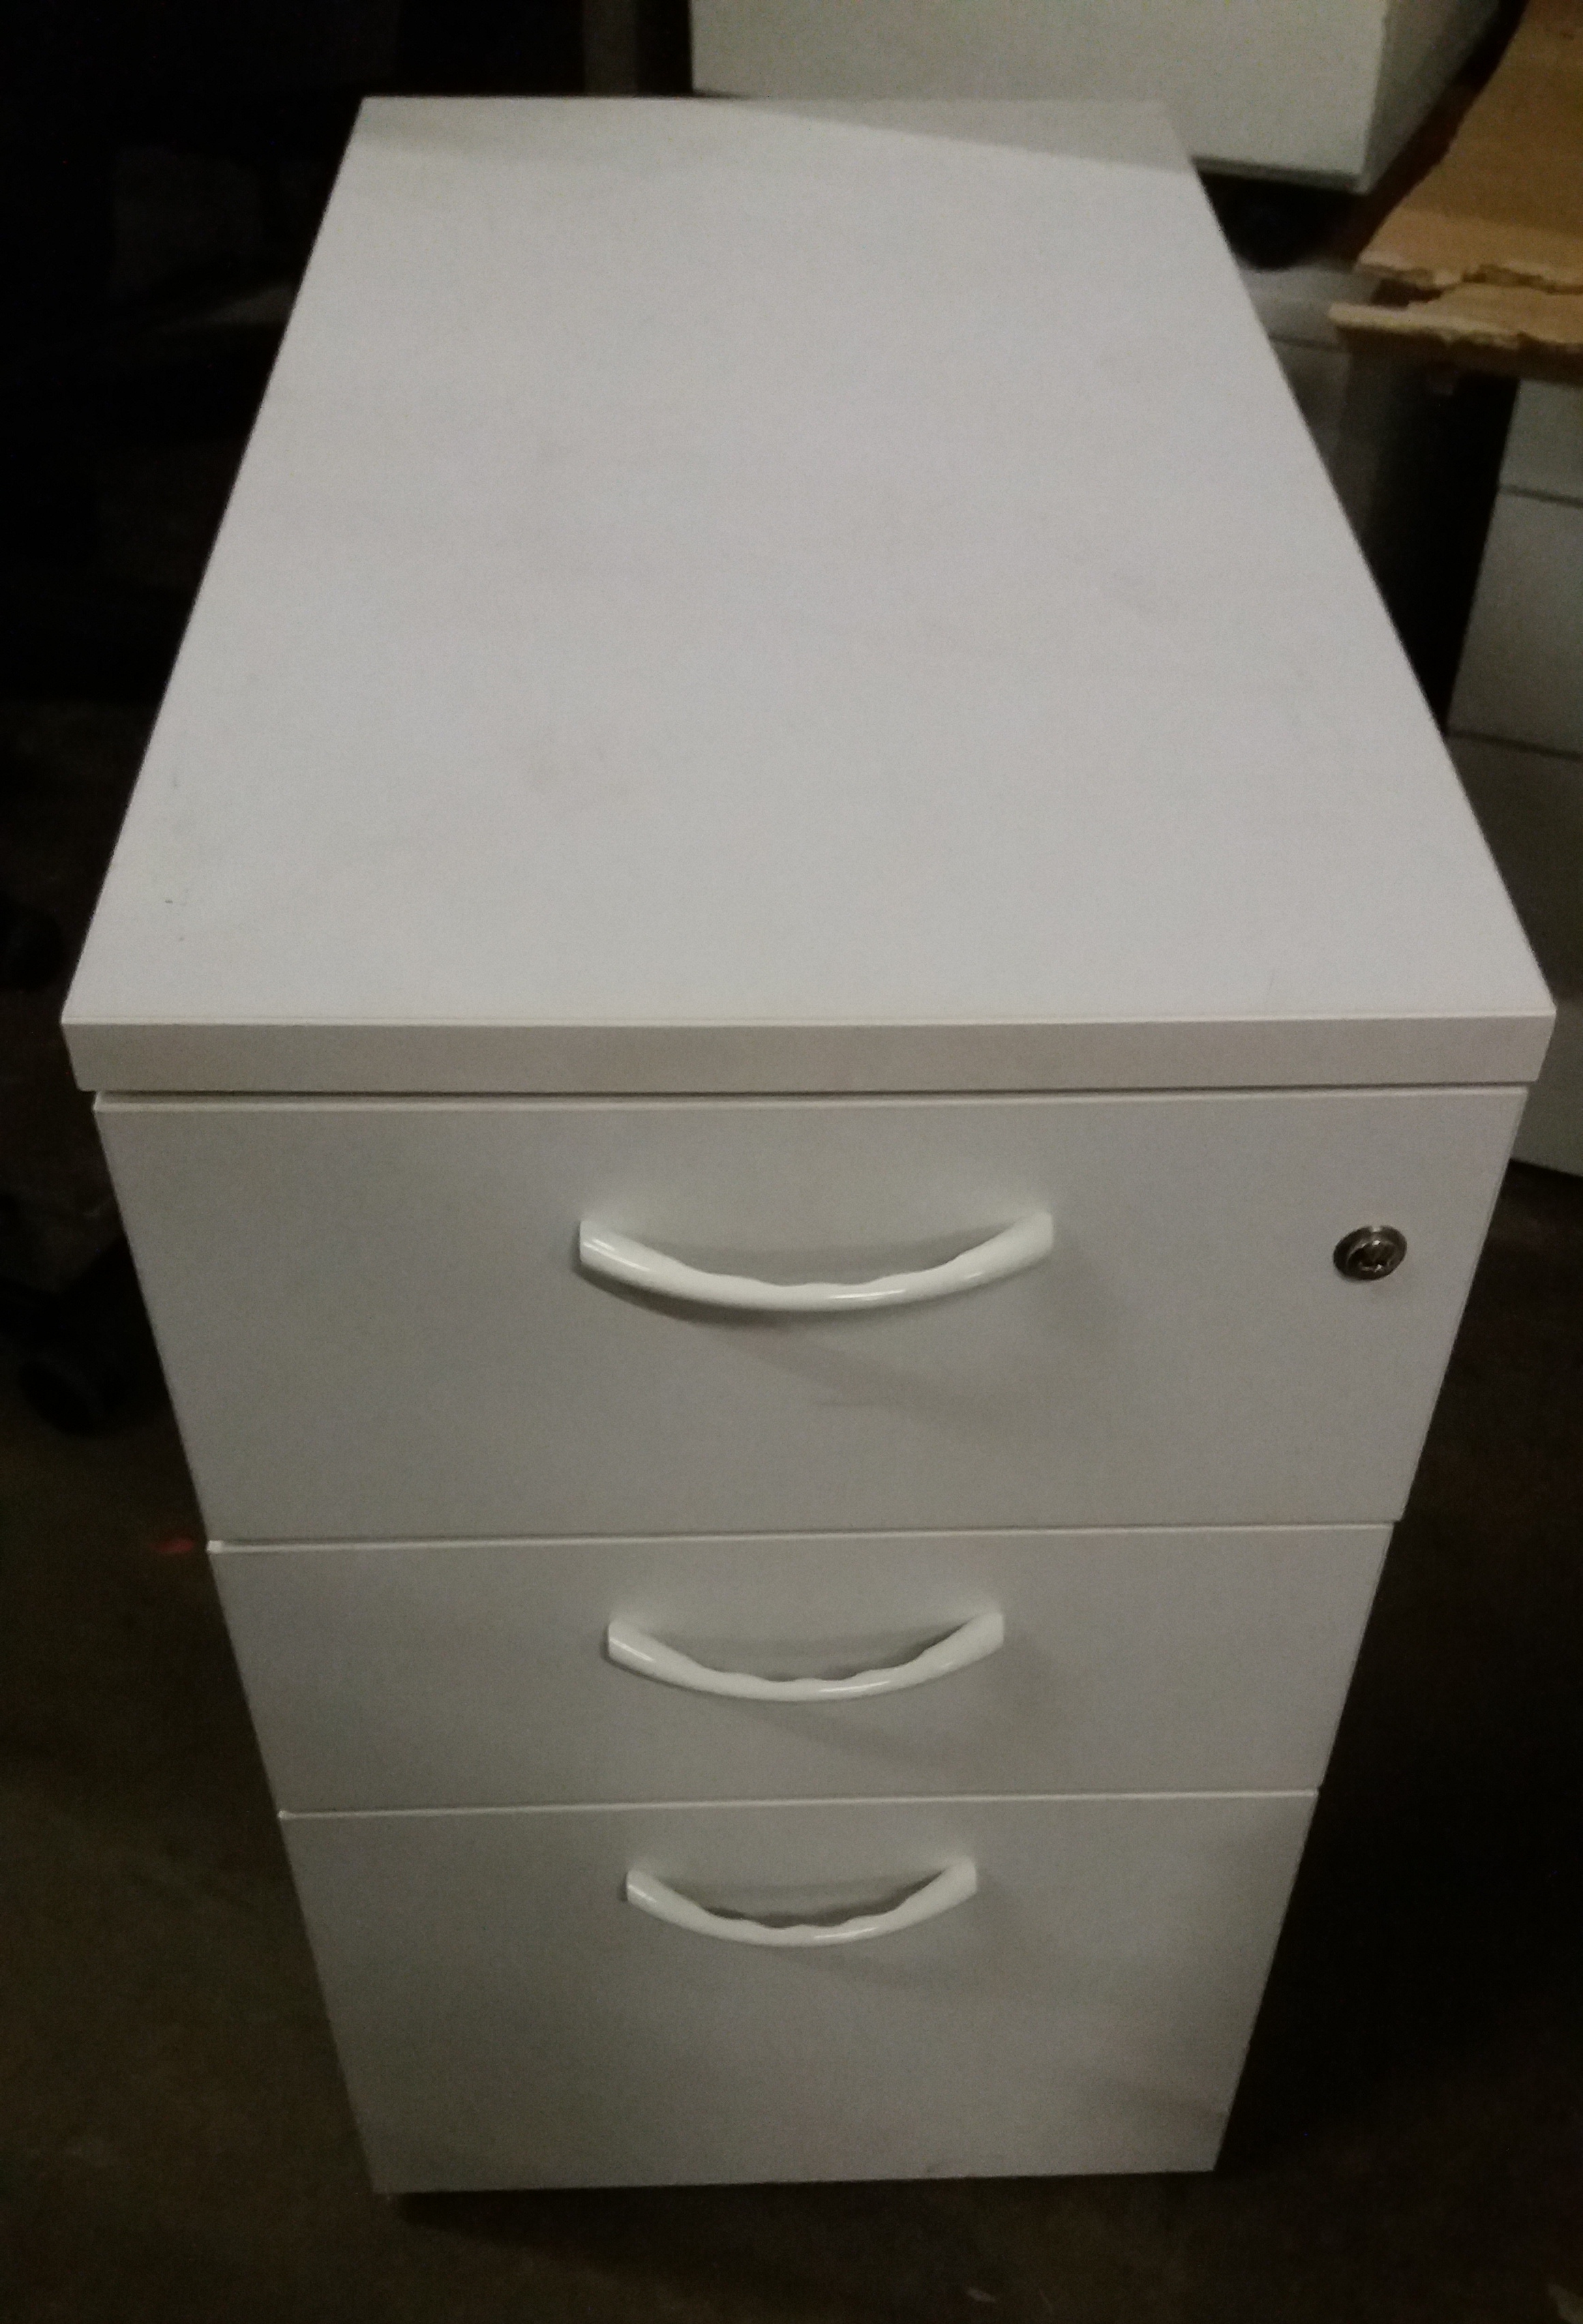 Lot 12 - 6x Under-desk Cabinets